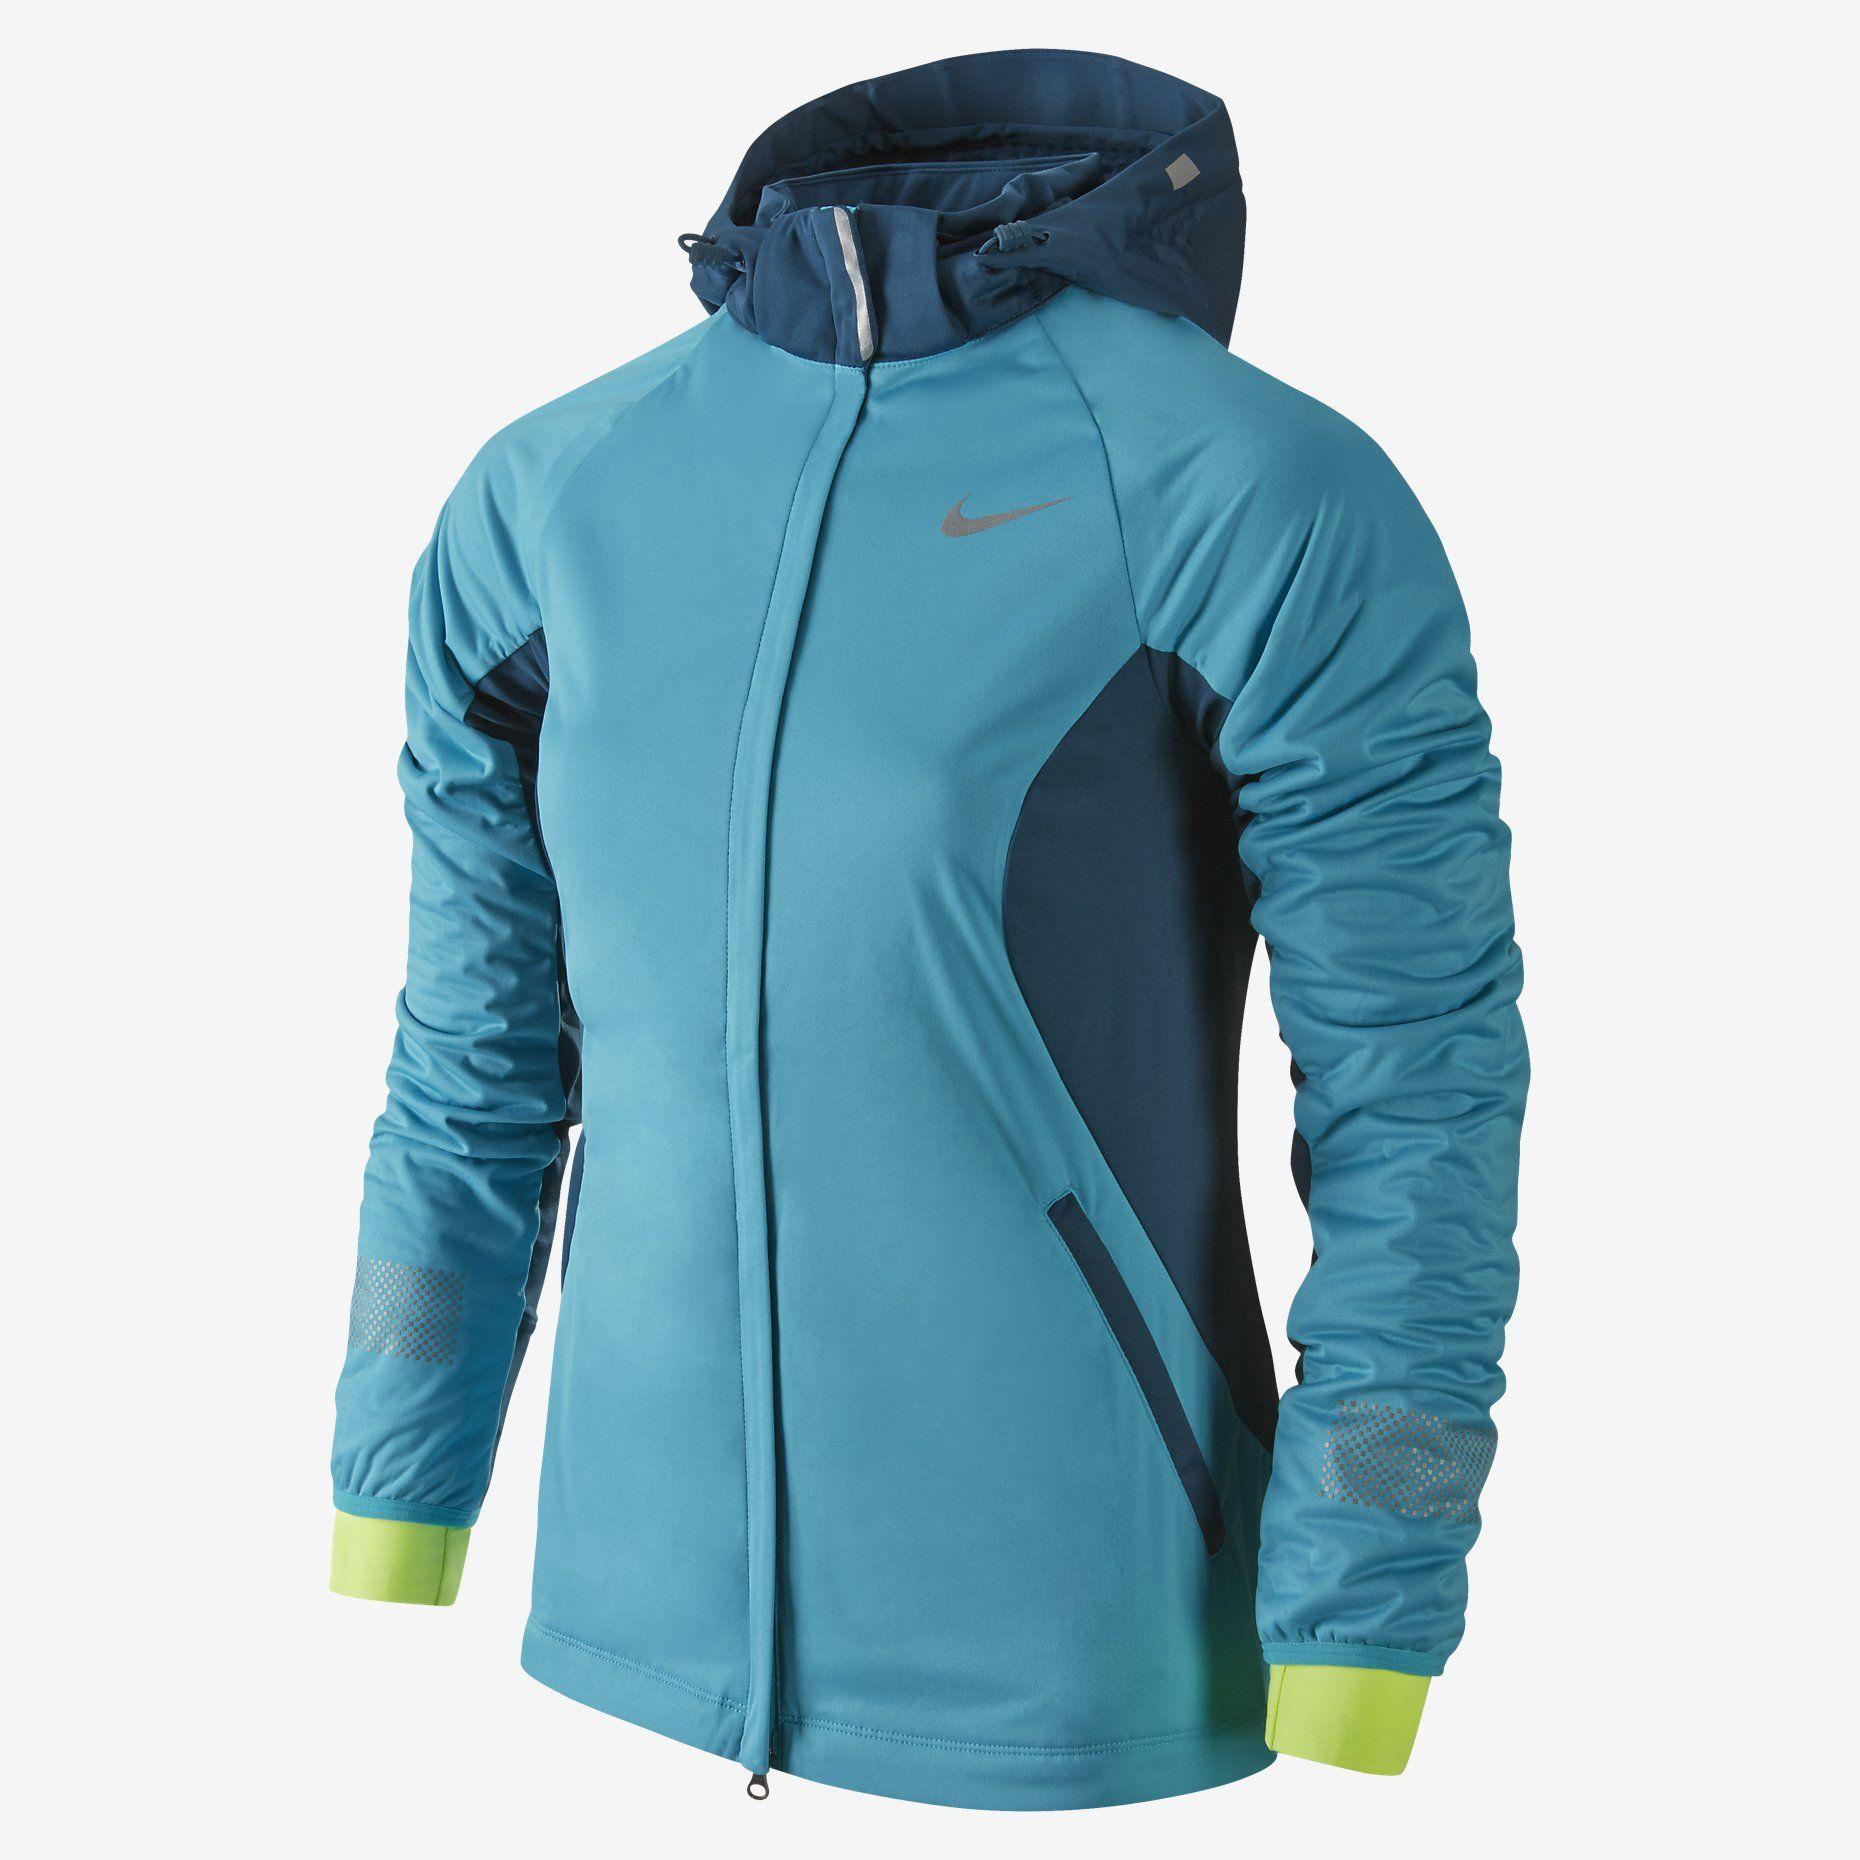 5edf38e24a1e Nike Shield Max Women s Running Jacket. Nike Store UK